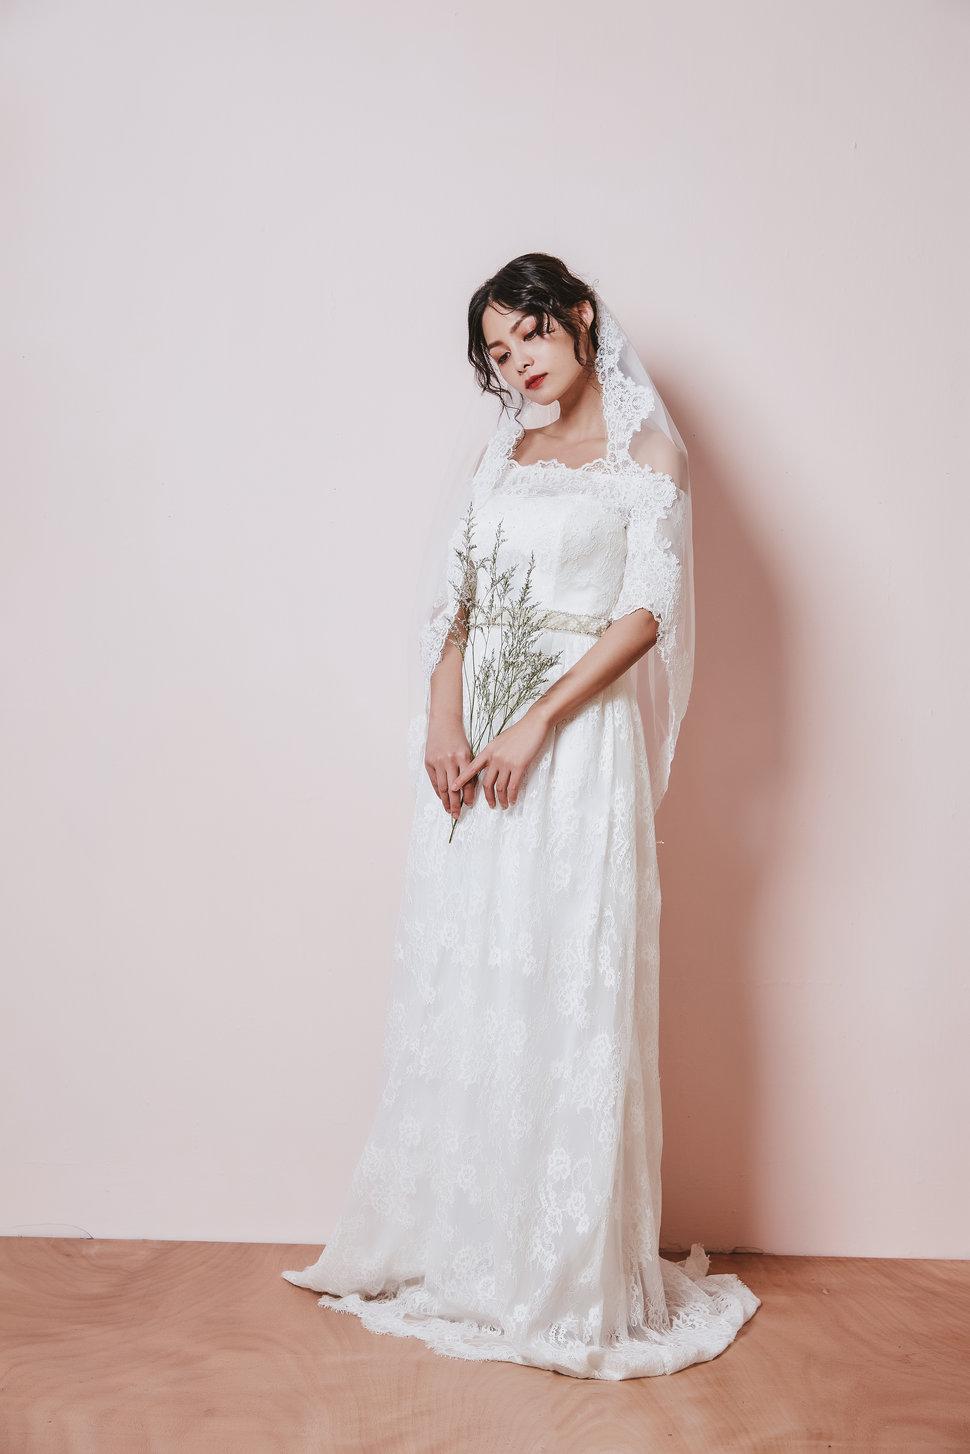 2019032718638 - Mikeshi wedding 米娔詩手《結婚吧》